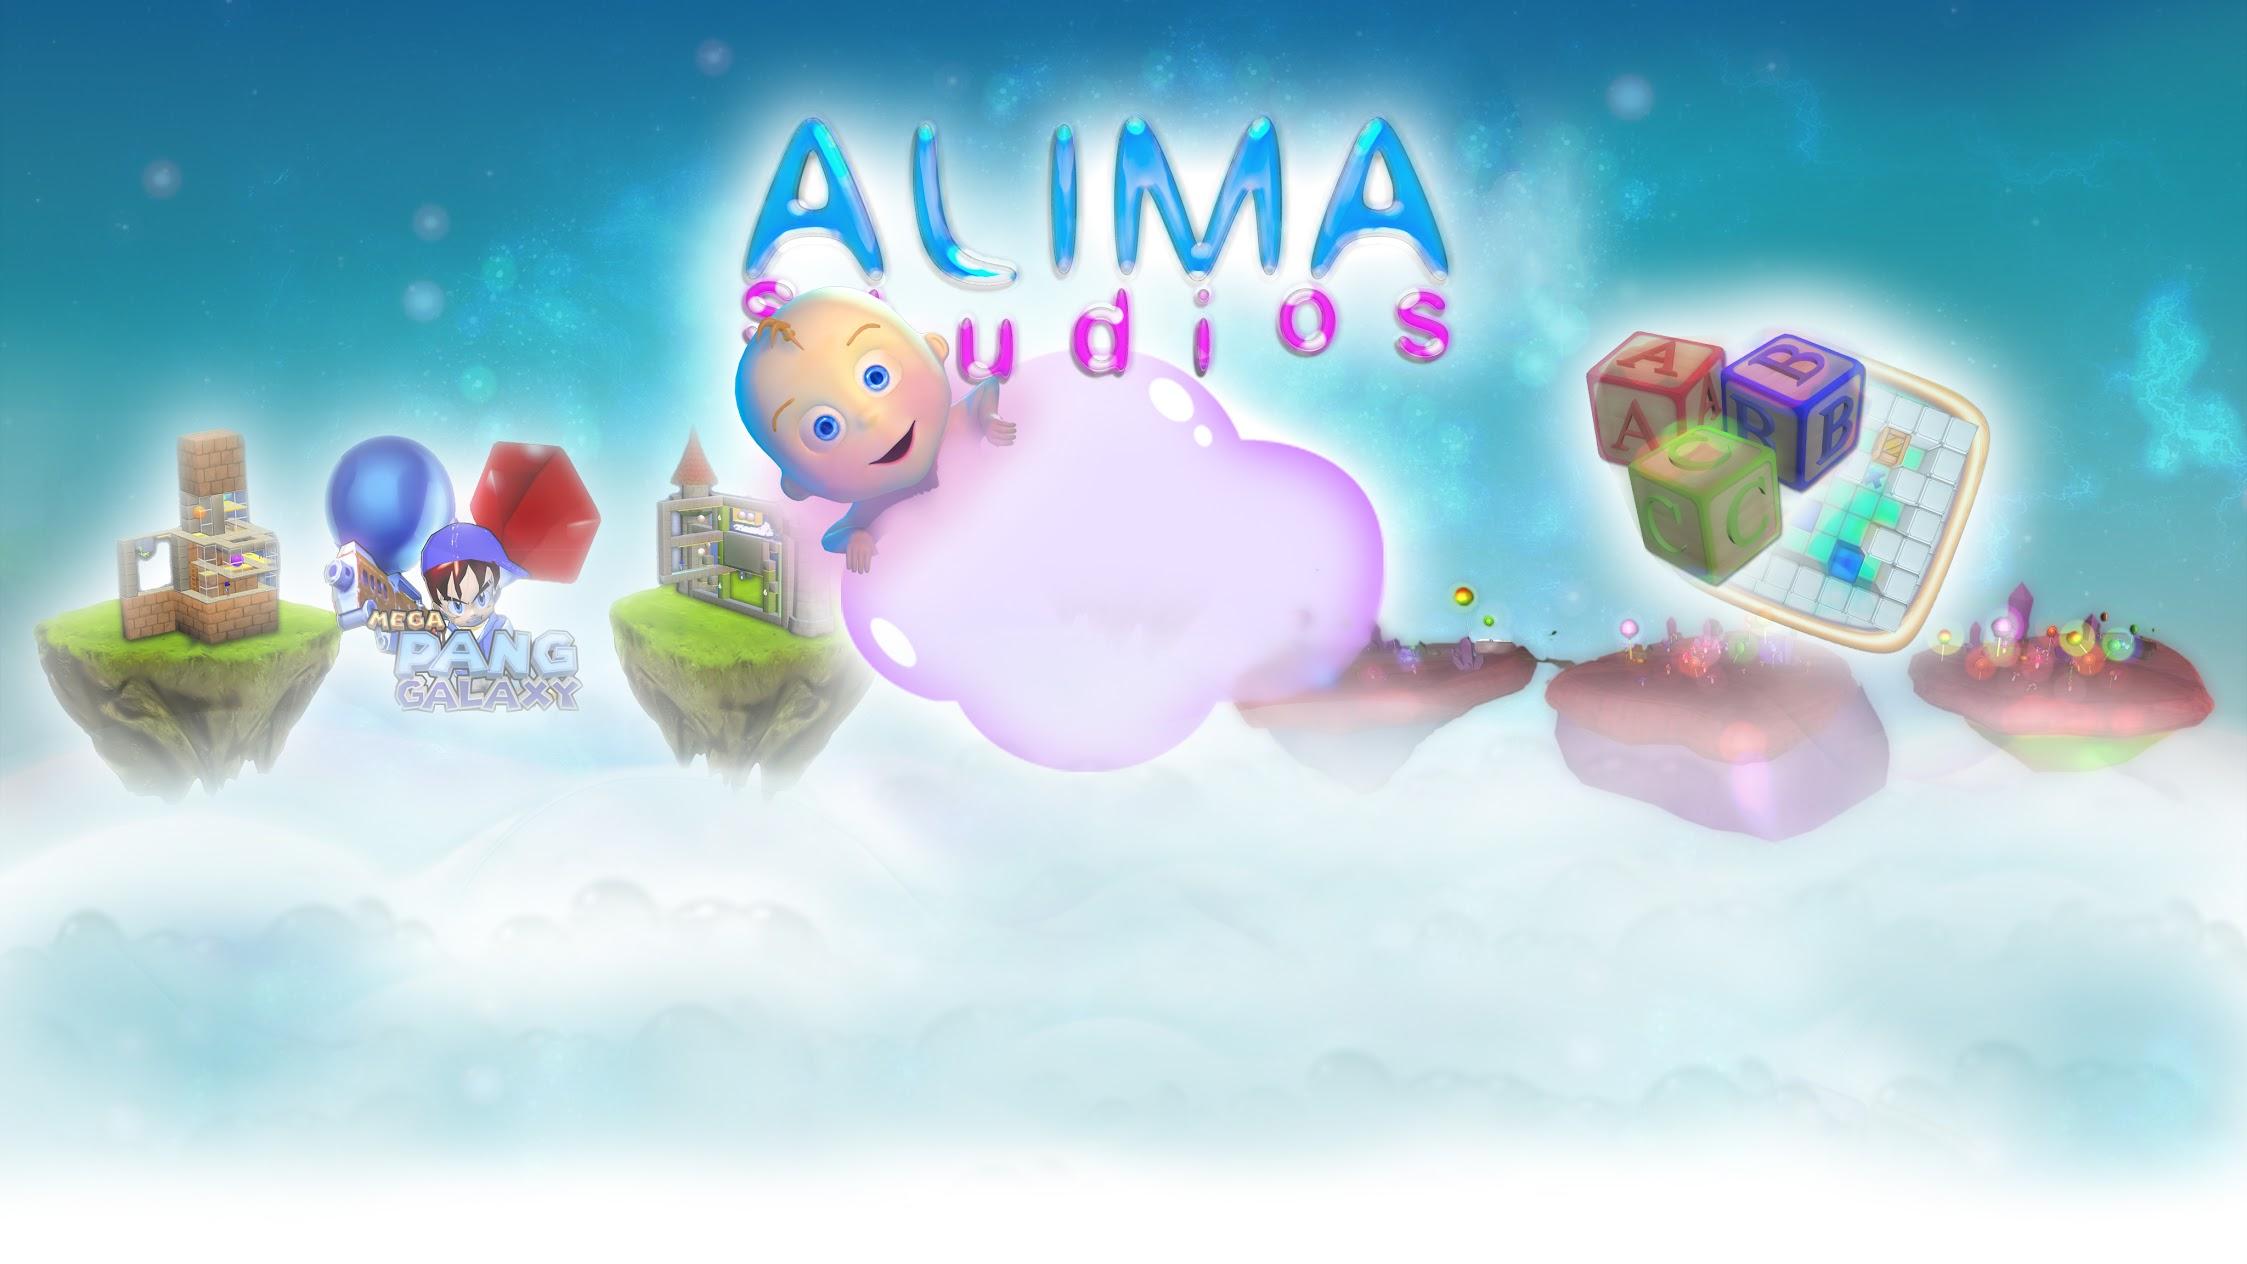 Alima Studios